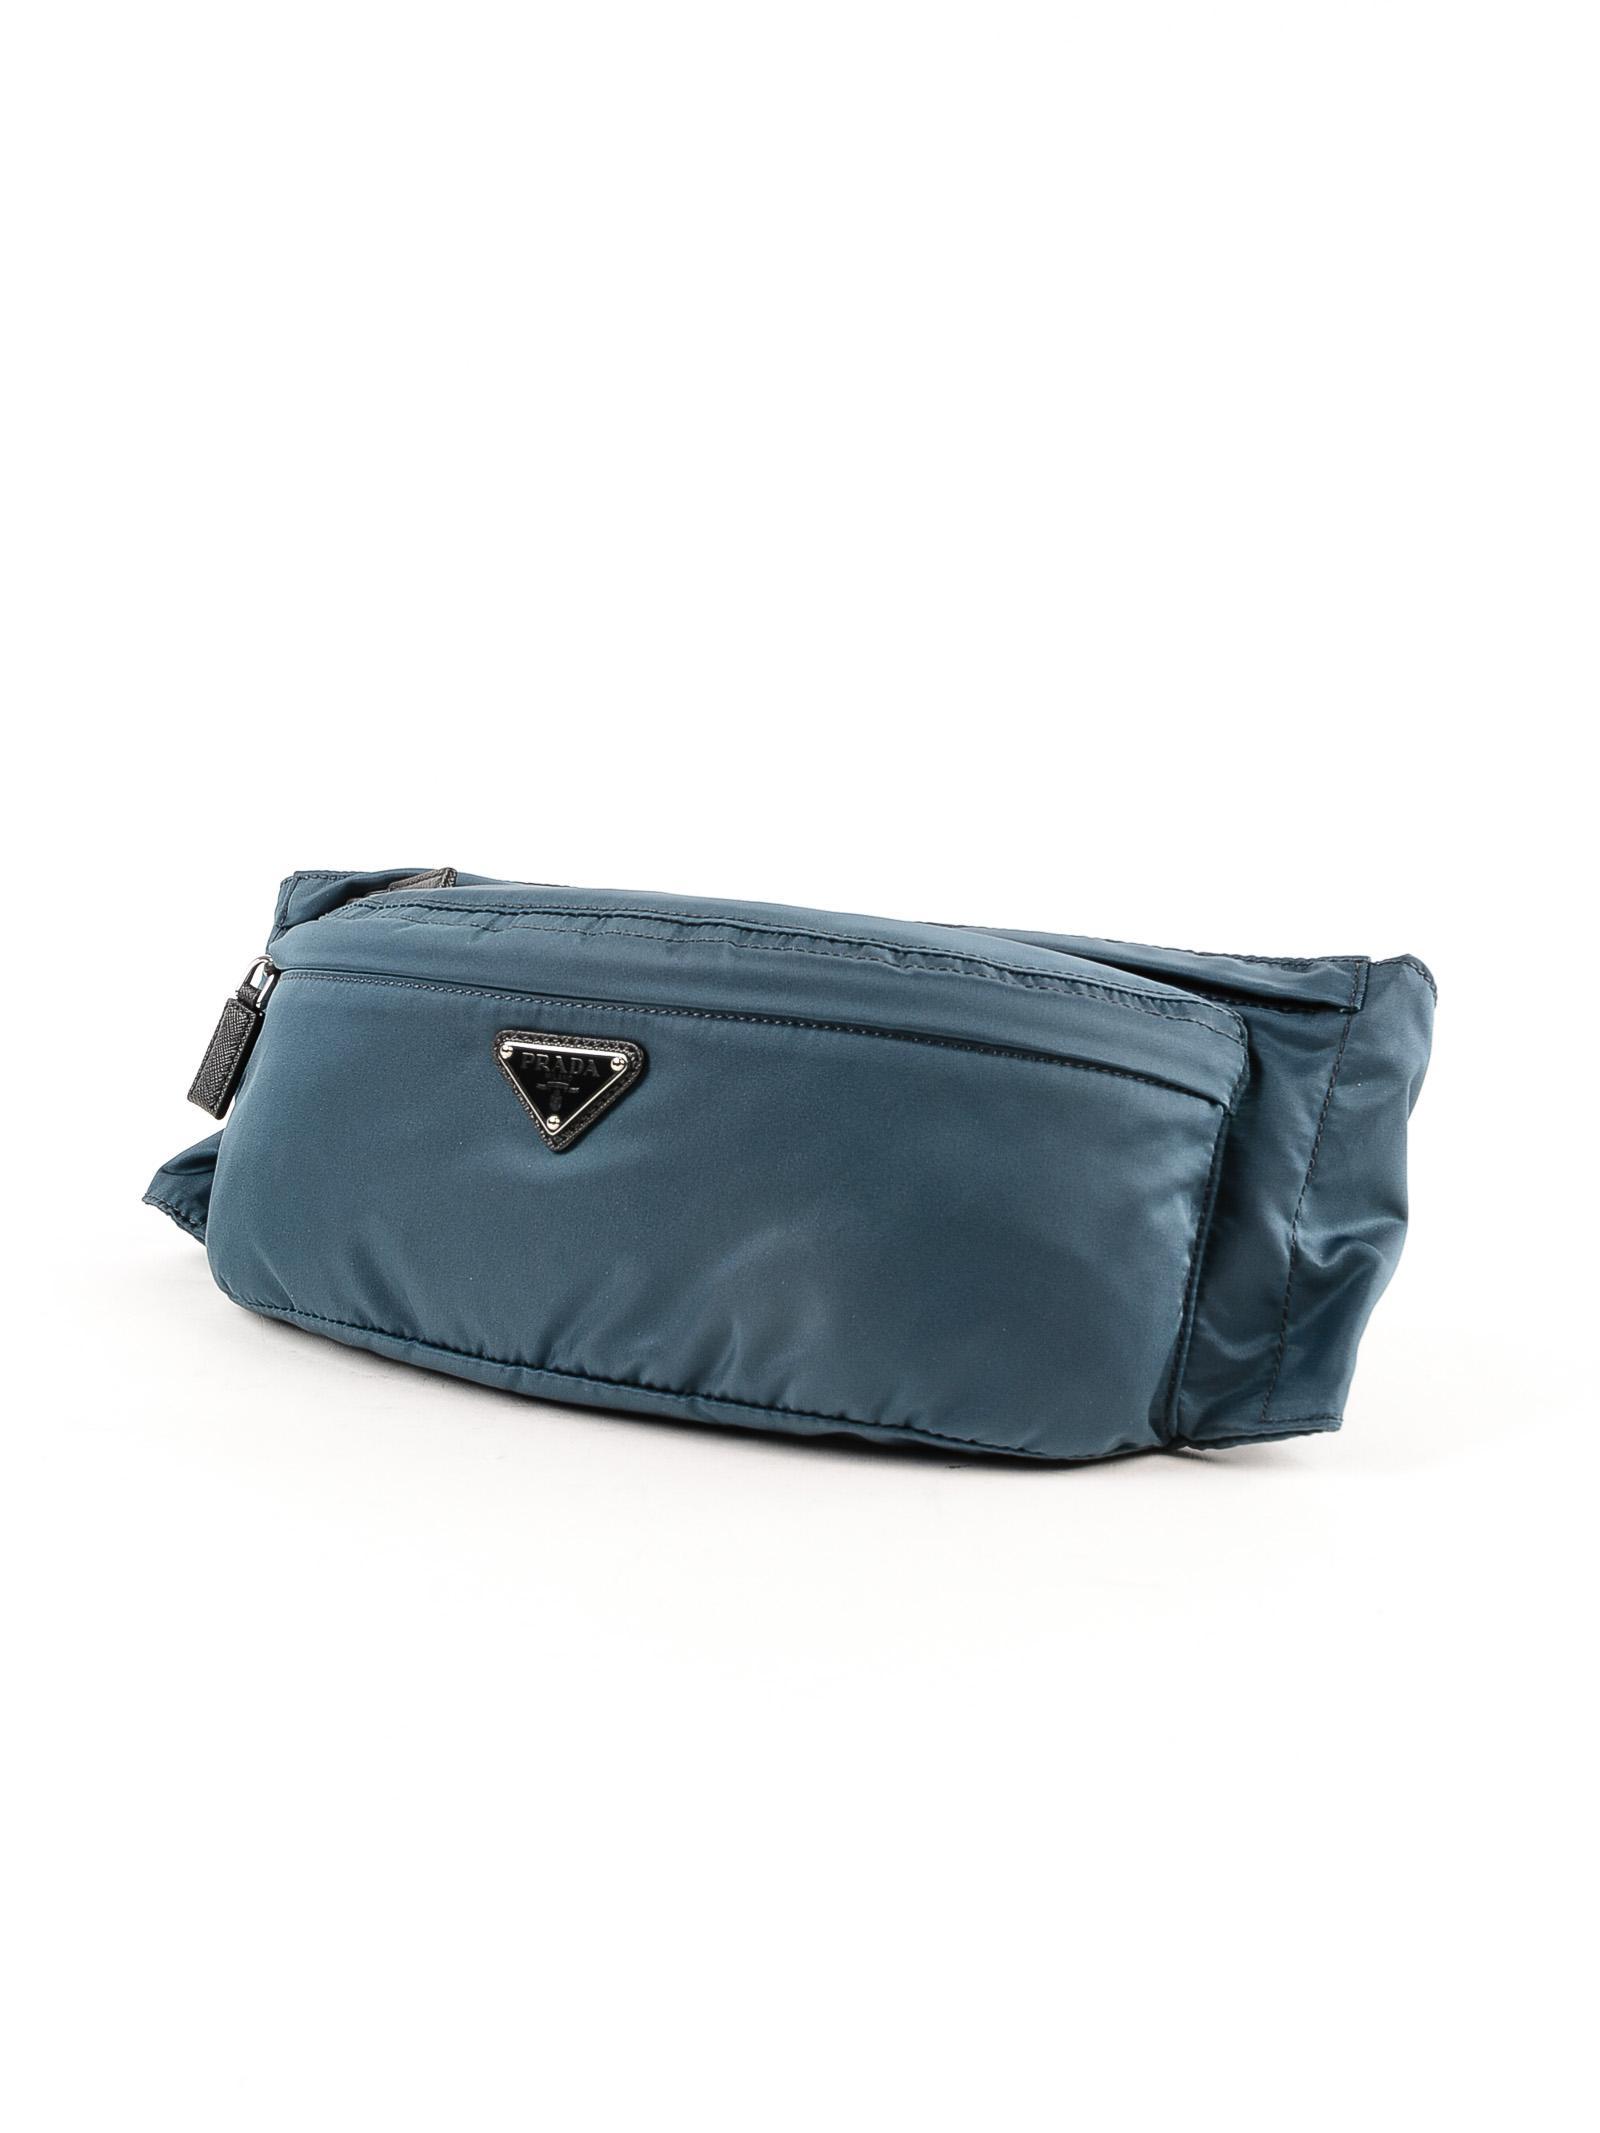 df728bd27e0408 Prada Belt Bag Tessuto Montagna in Blue for Men - Lyst